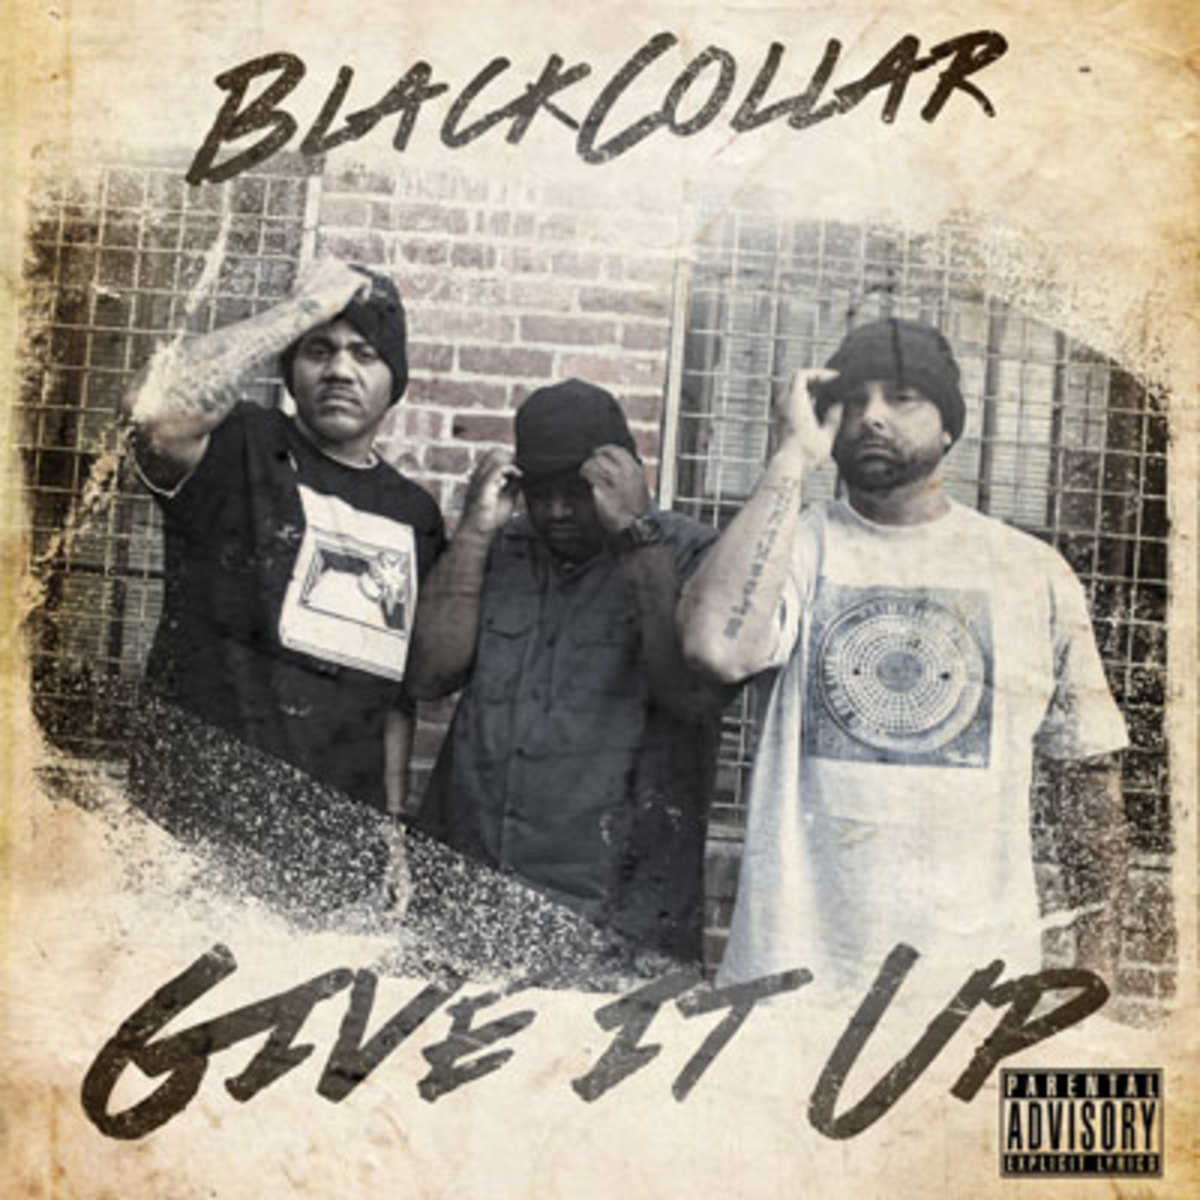 blackcollar-giveitup.jpg